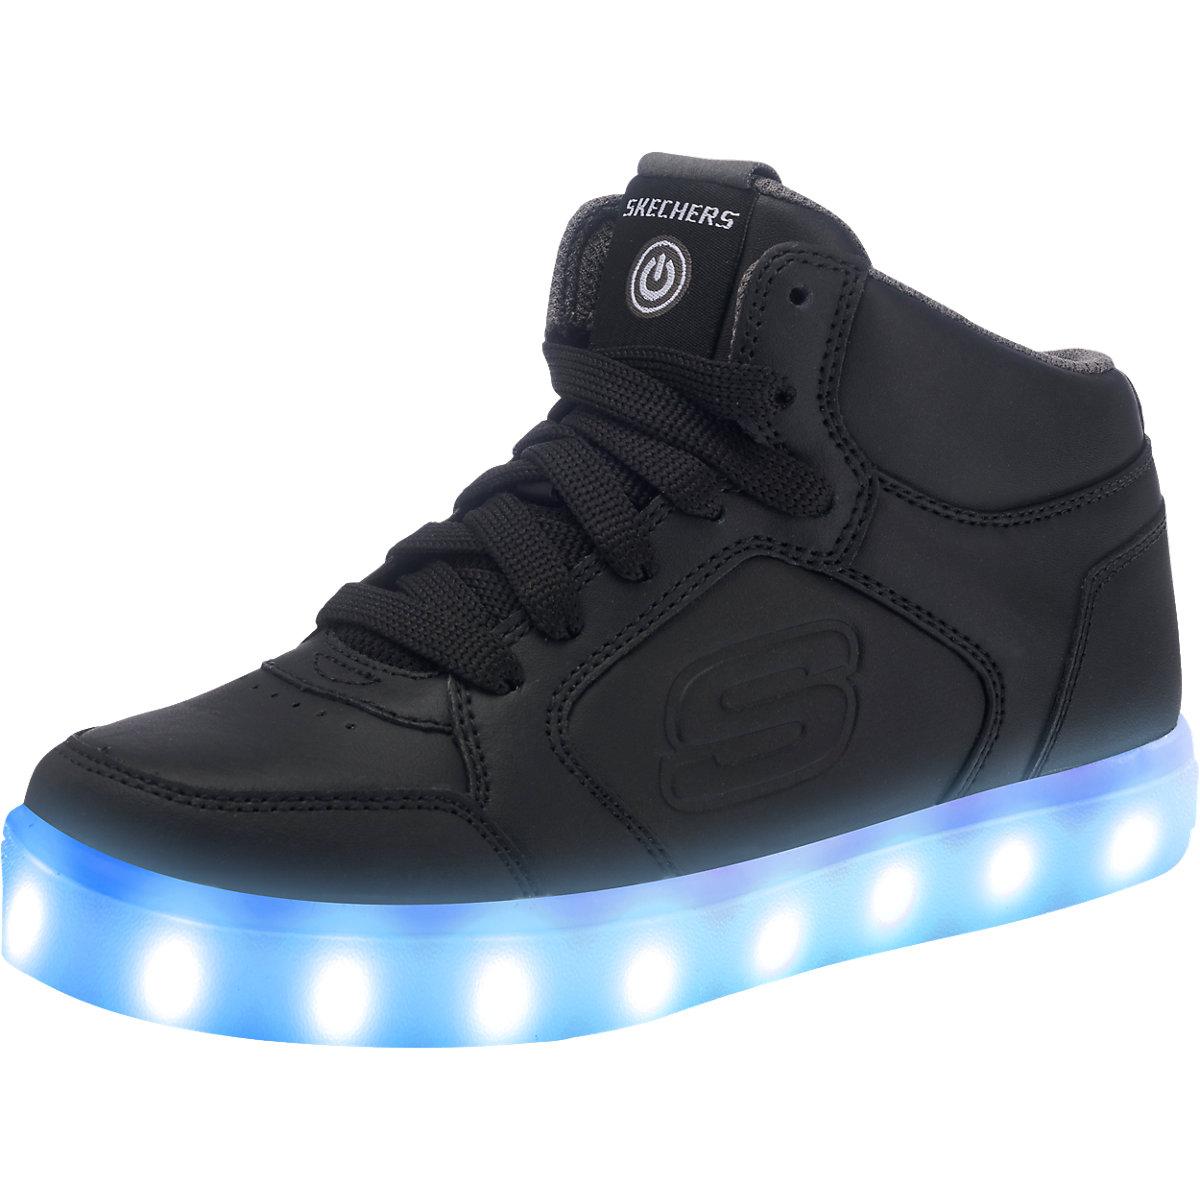 skechers kinder sneakers high blinkies mit led sohle schwarz mirapodo. Black Bedroom Furniture Sets. Home Design Ideas